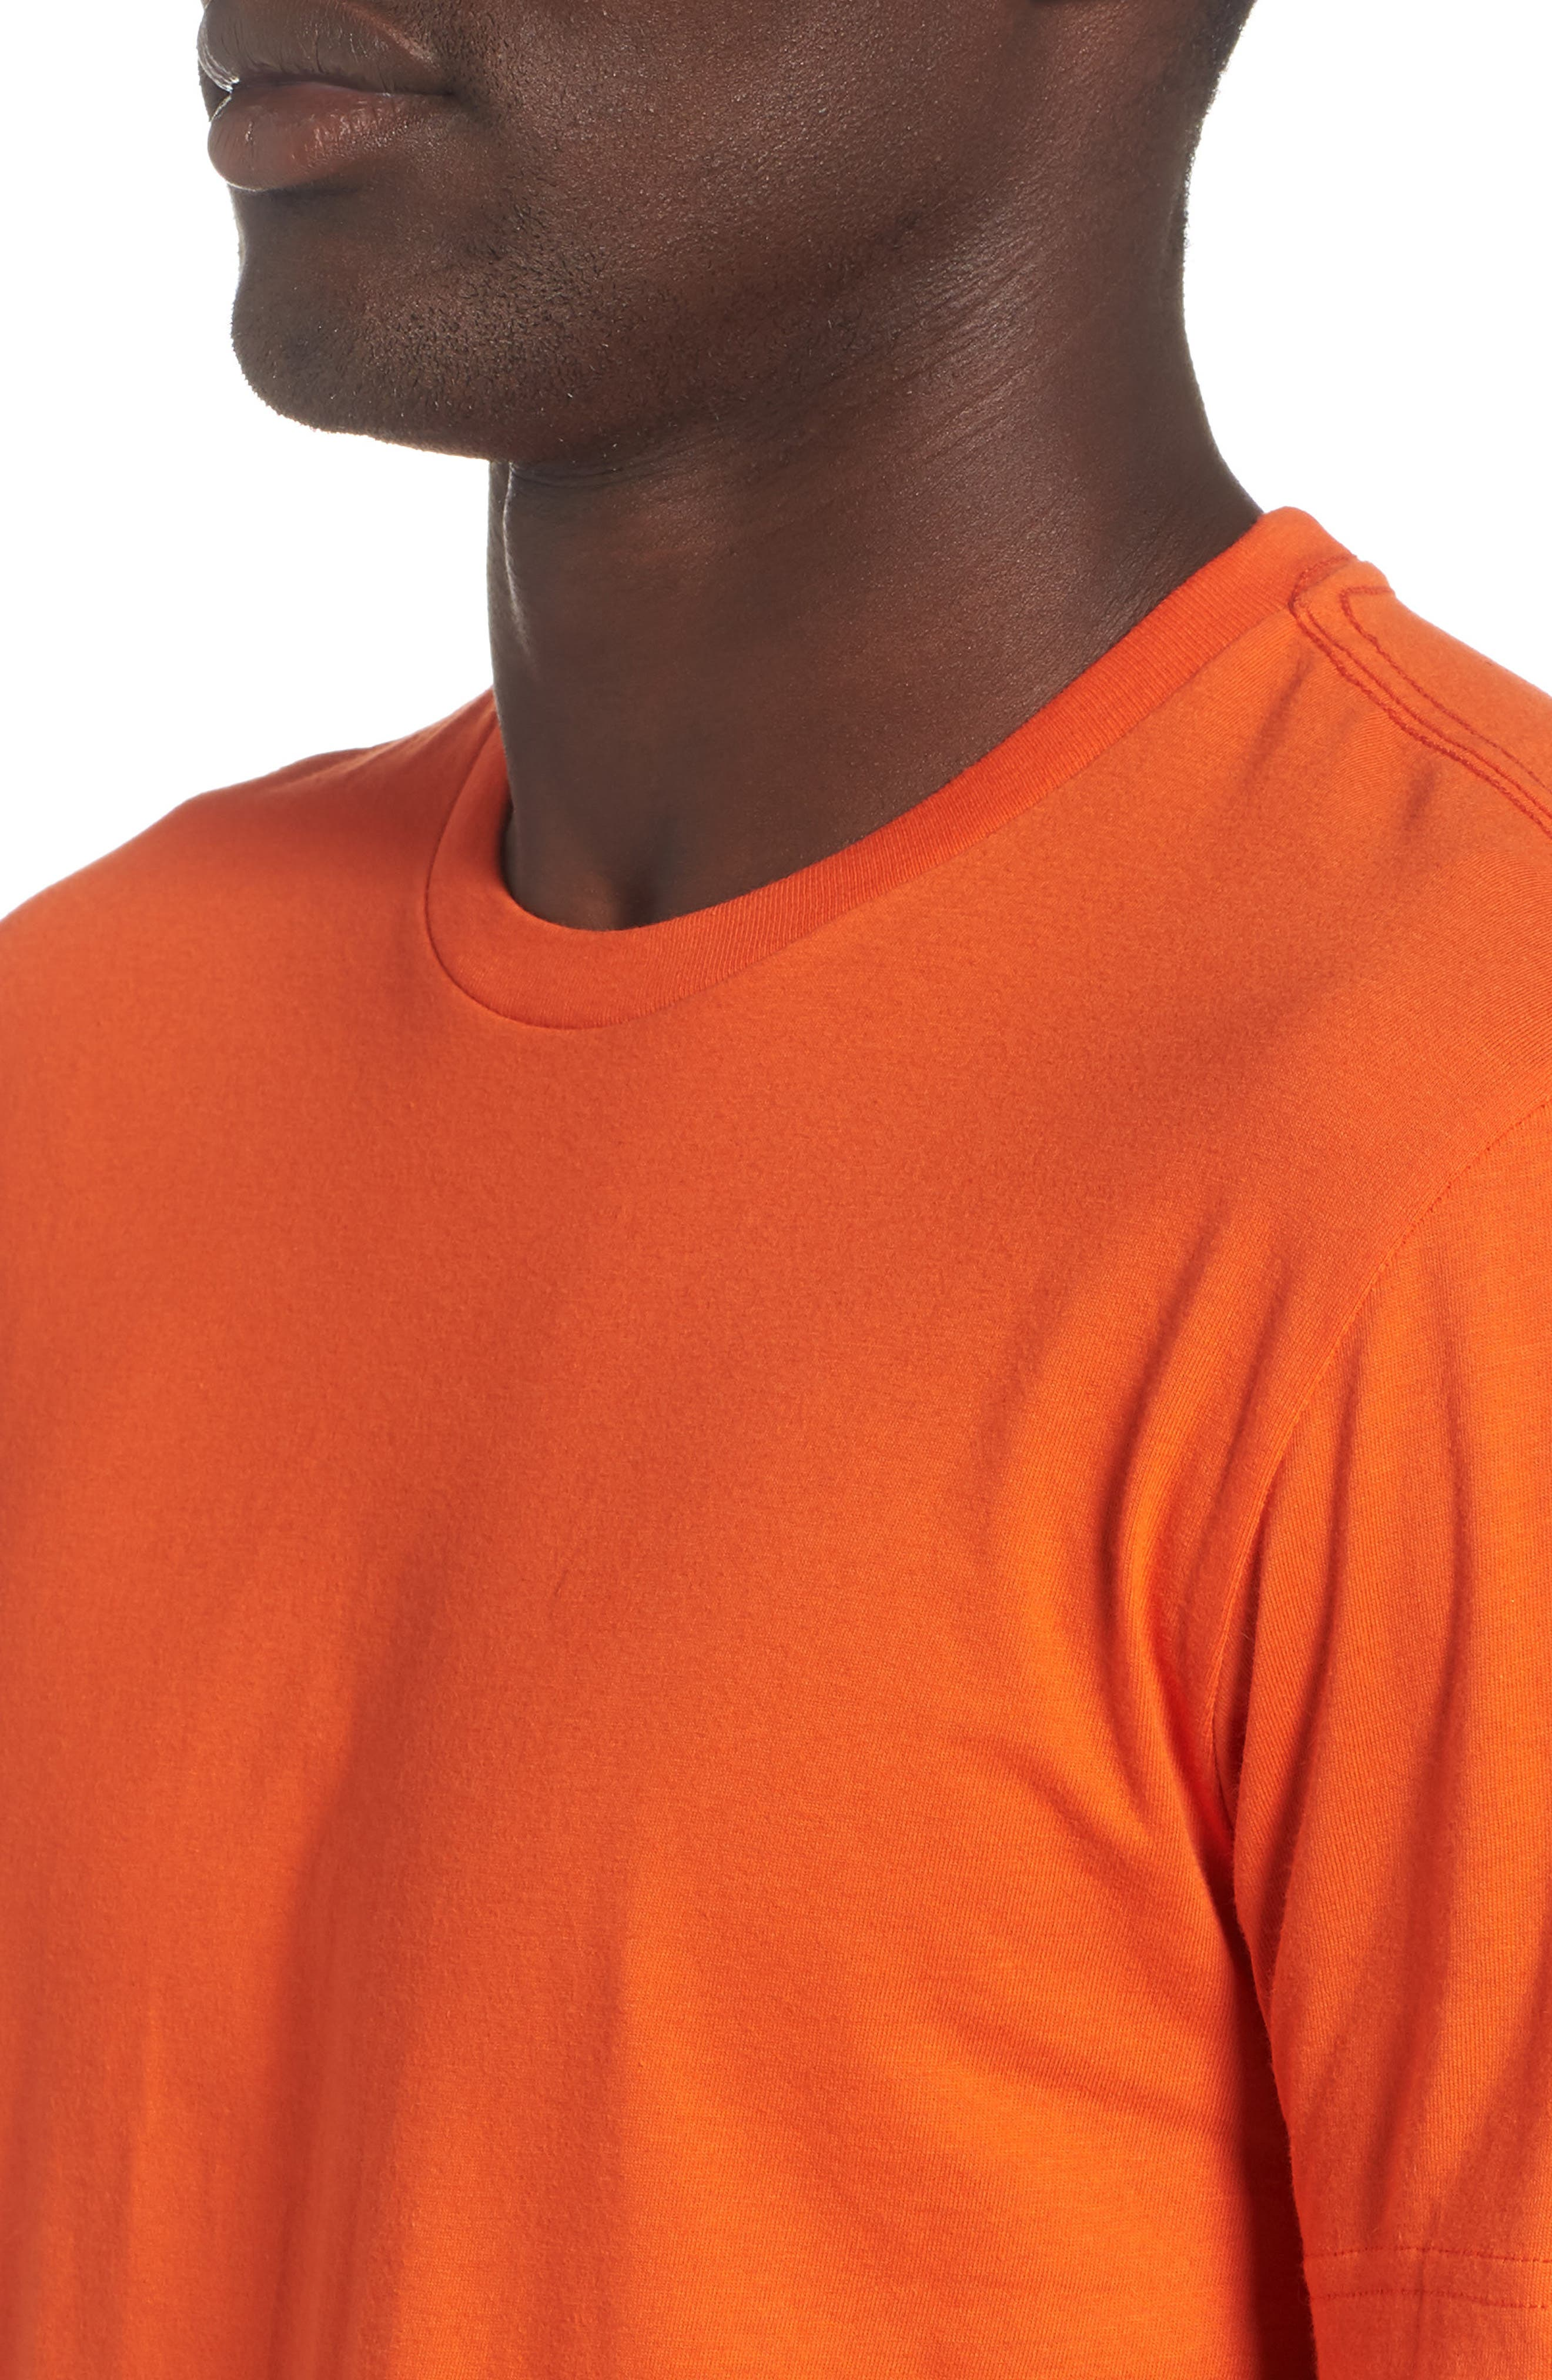 3-Pack Classic Fit T-Shirts,                             Alternate thumbnail 5, color,                             ORANGE/ GREEN/ ROYAL